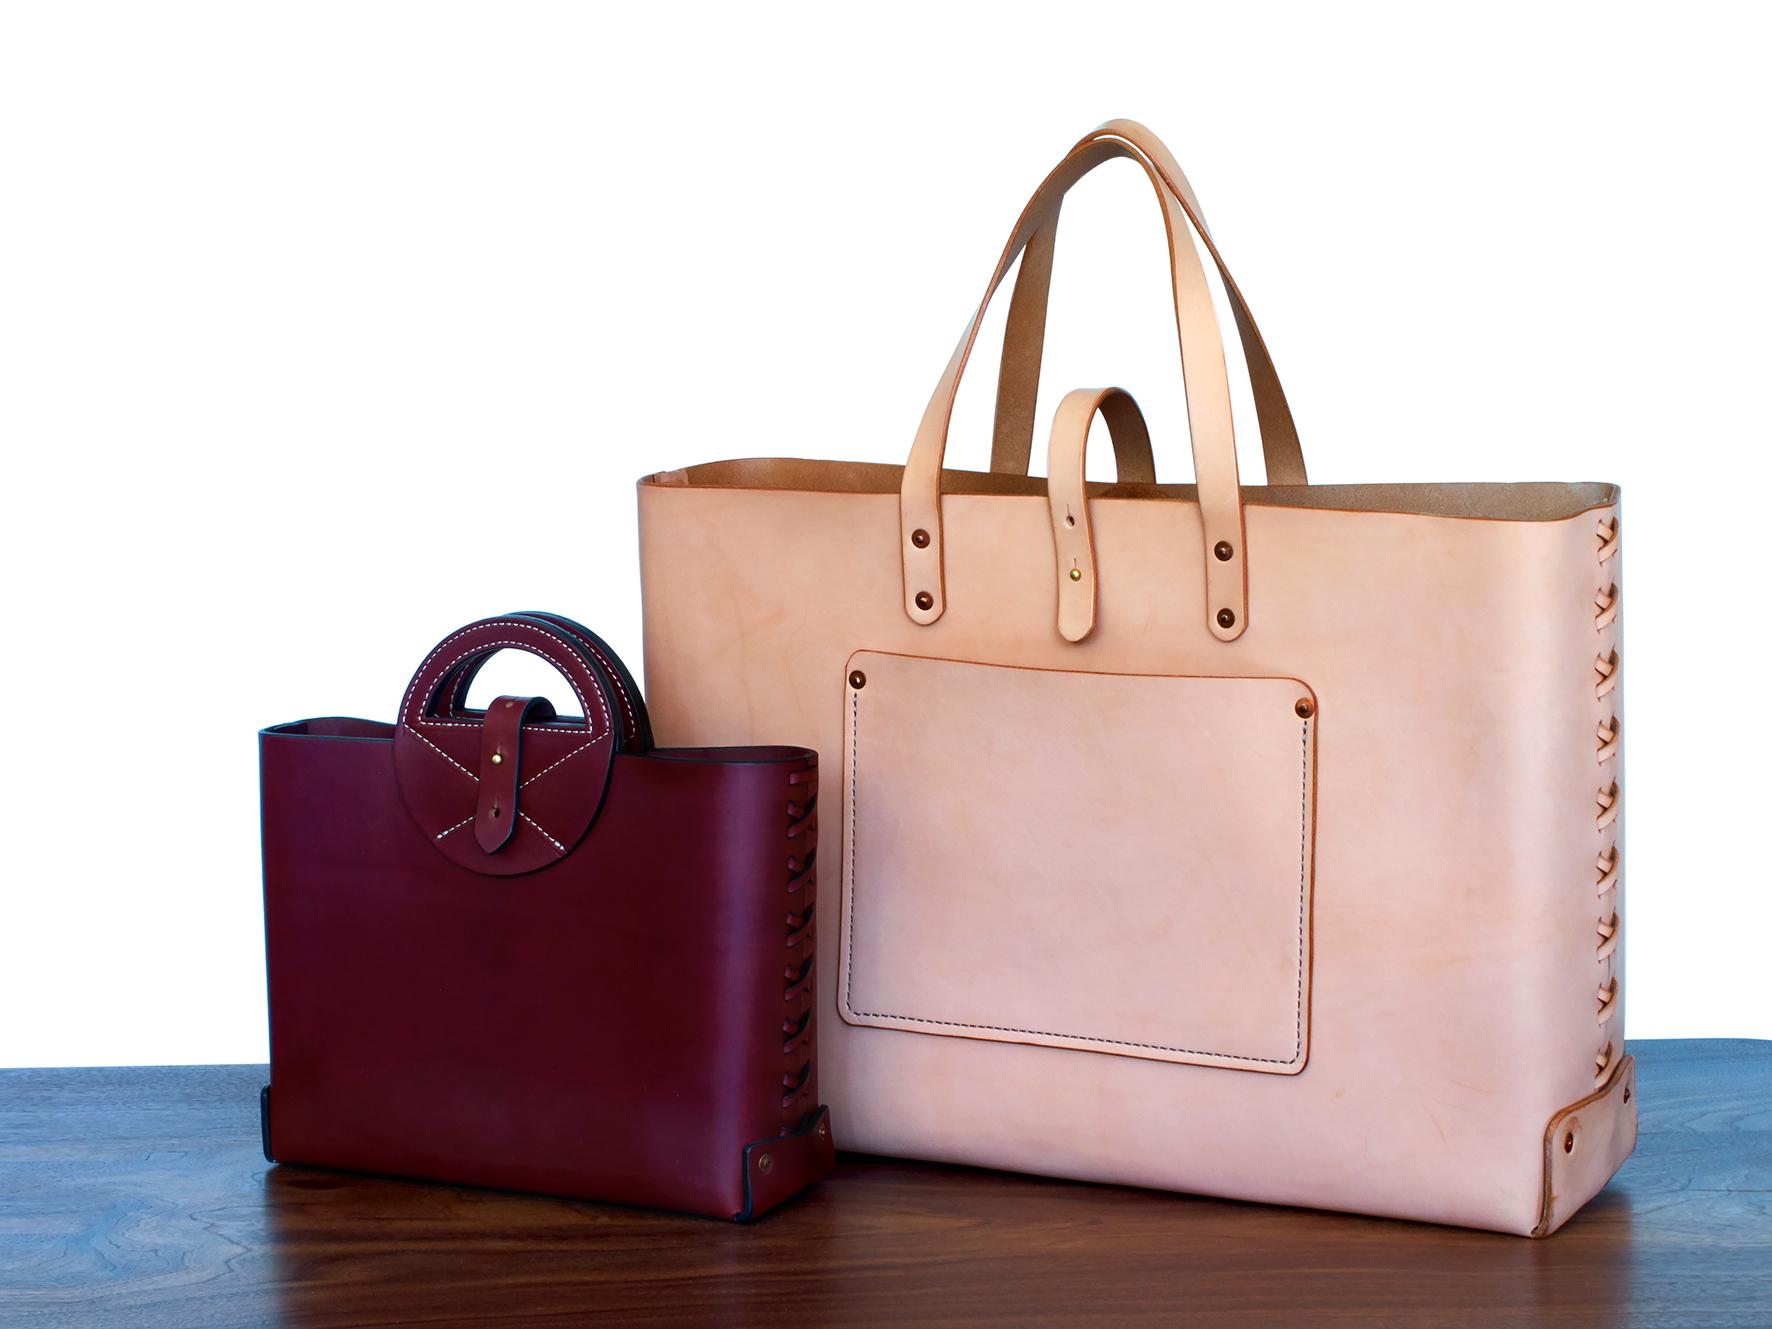 Burgundy Handbag & Natural Leather Supply Tote